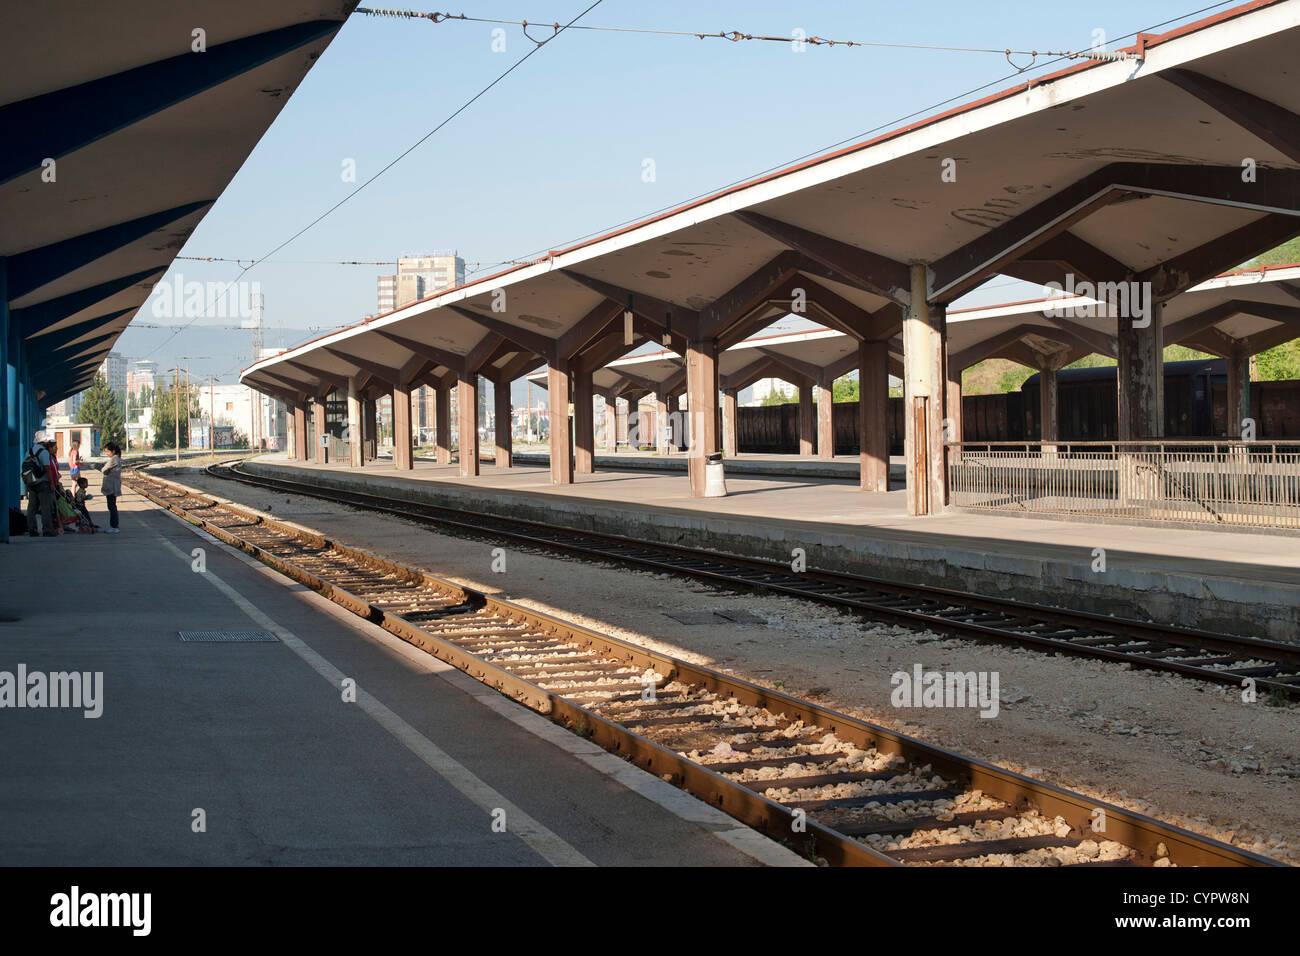 Sarajevo train station platforms in Bosnia and Herzegovina. - Stock Image